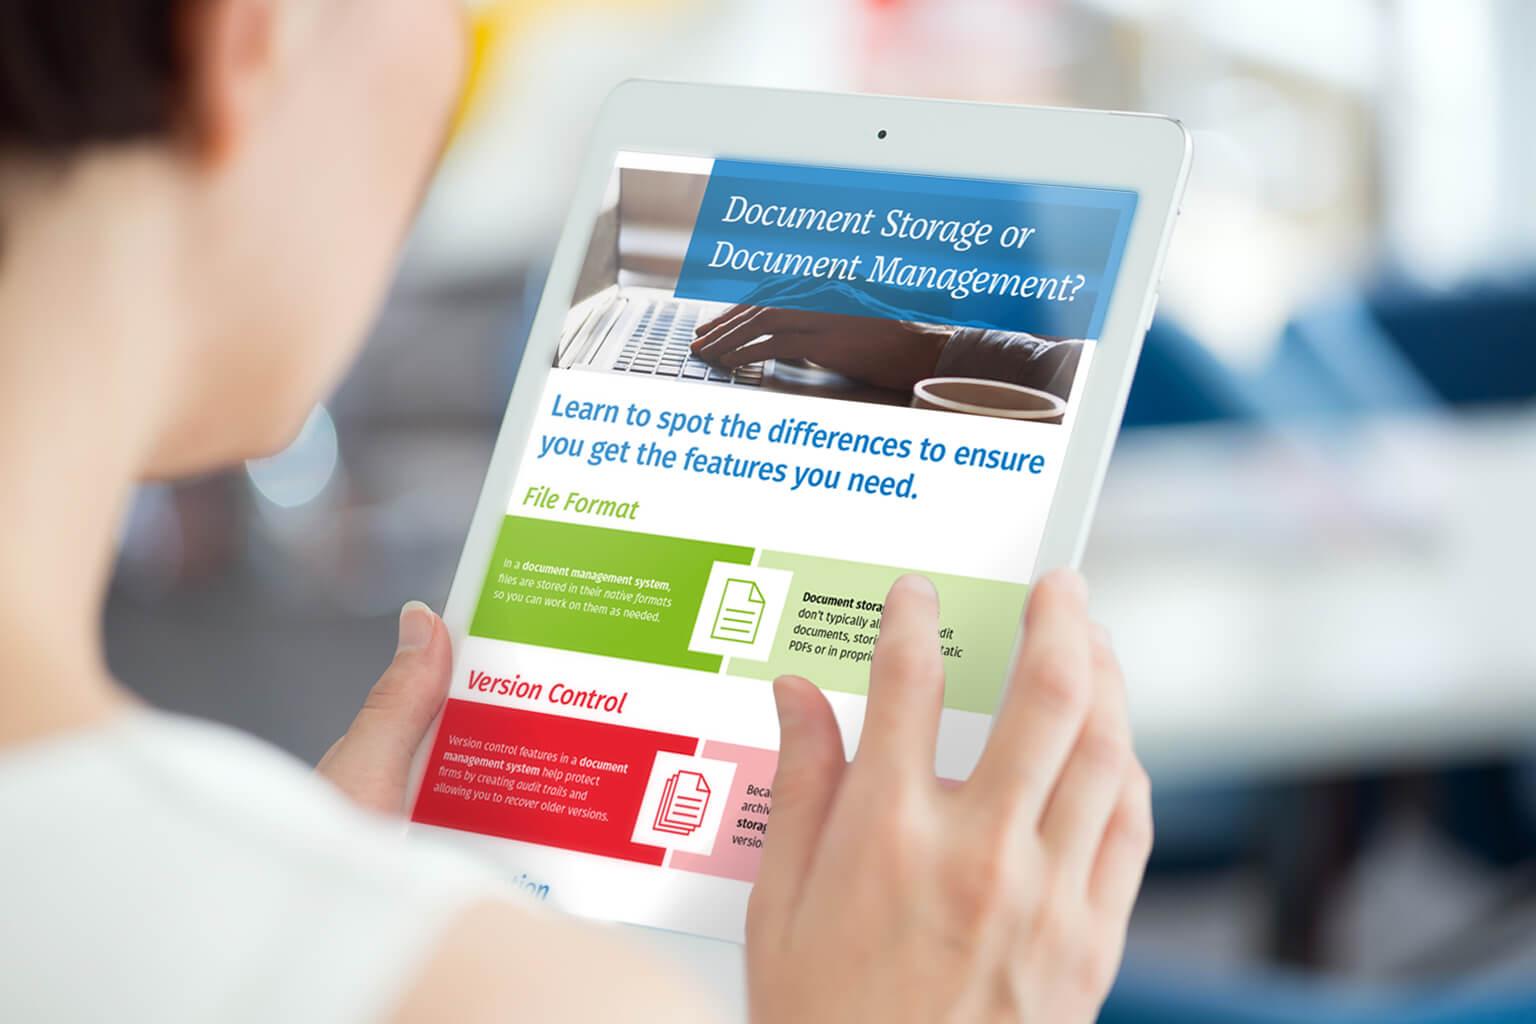 Document storage vs Document management infographic